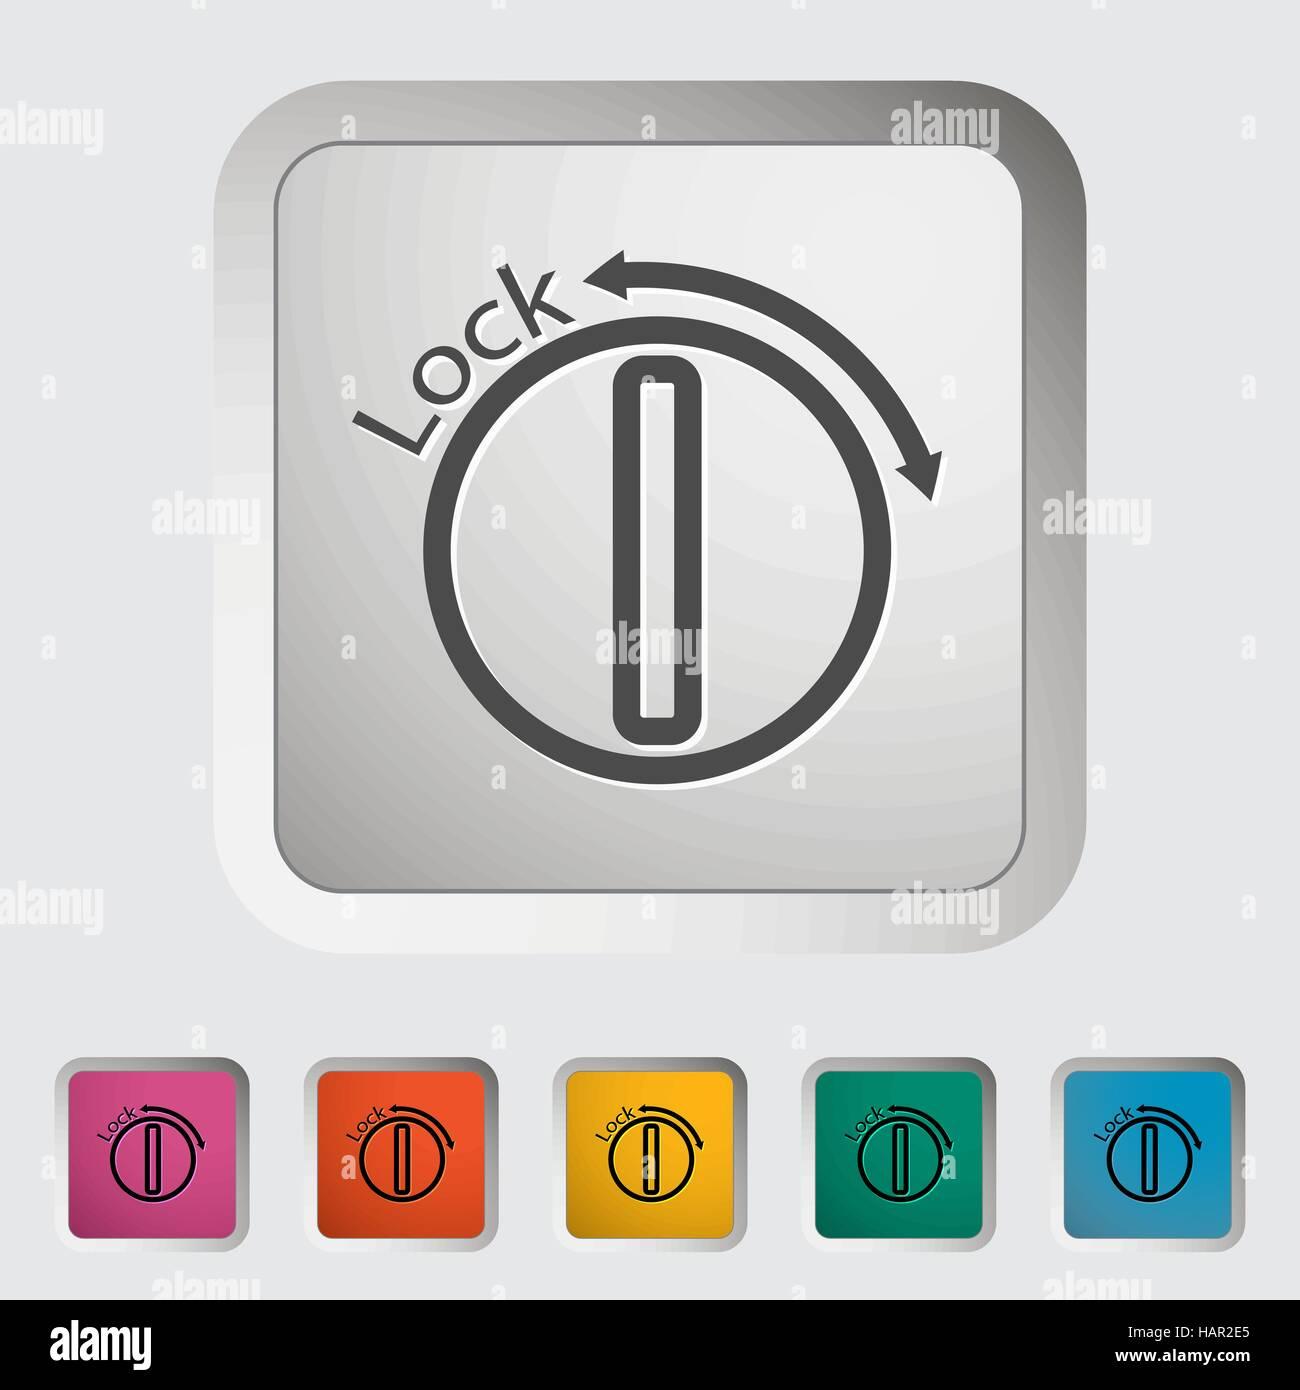 Ignition. Single icon. Vector illustration. - Stock Image